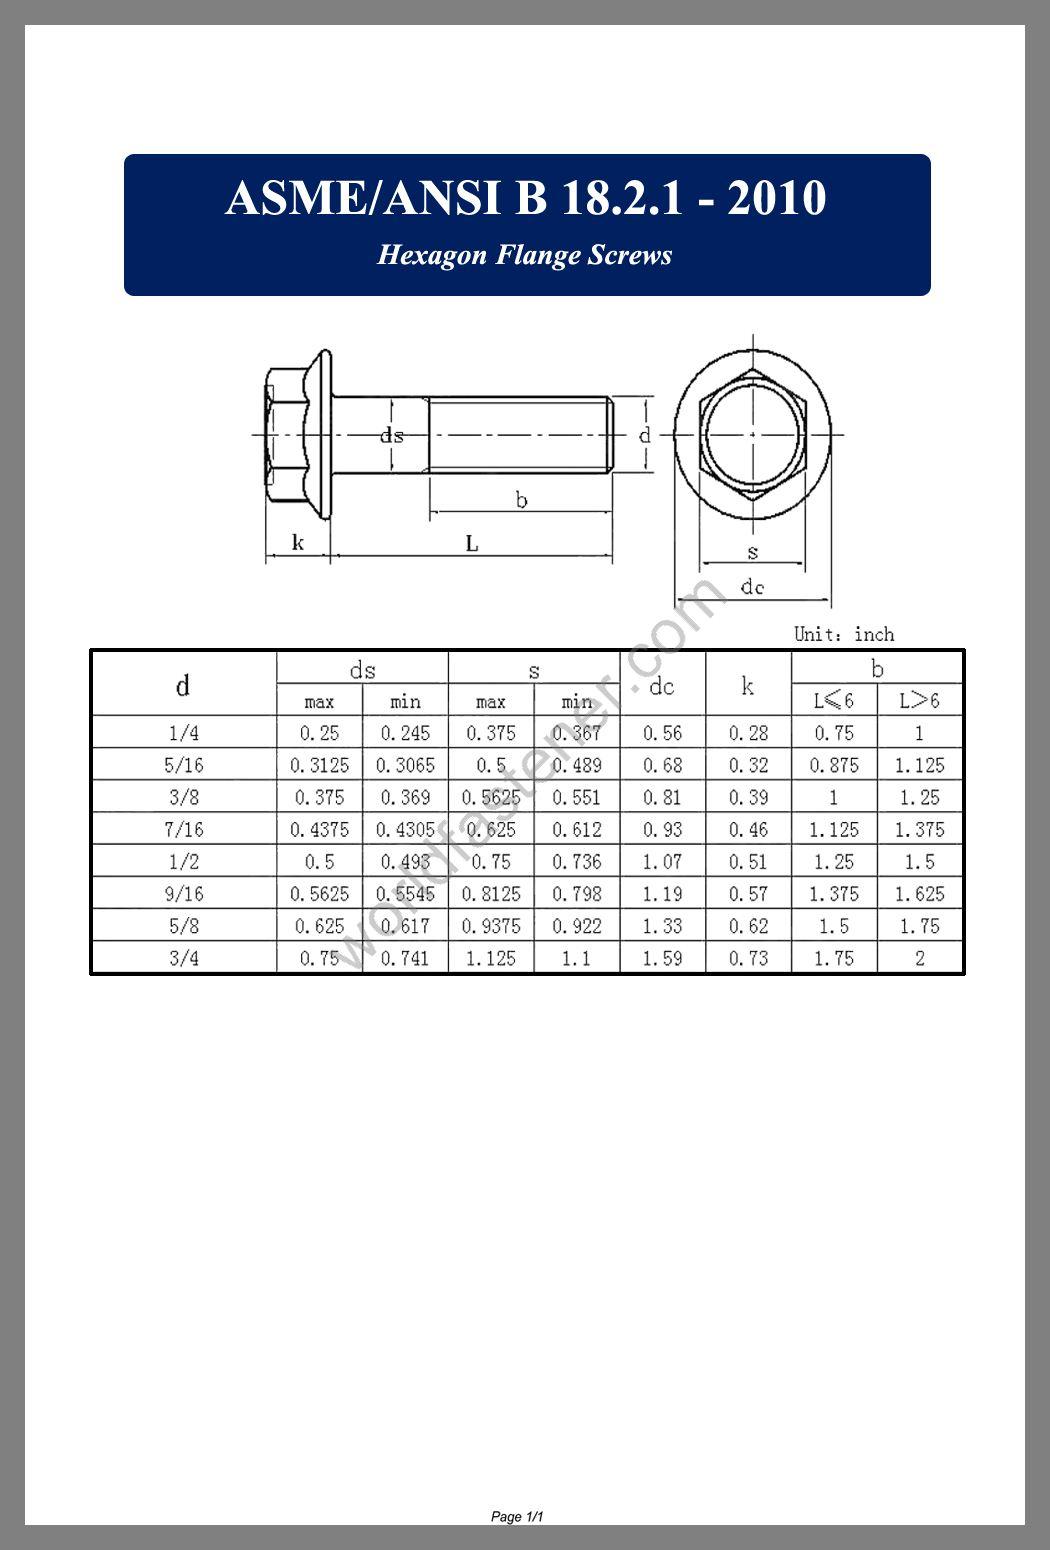 ASME-ANSI B 18.2.1 Flanged Bolts, Flange Bolts, fastener, screw, bolt, ASME bolts, ANSI screws